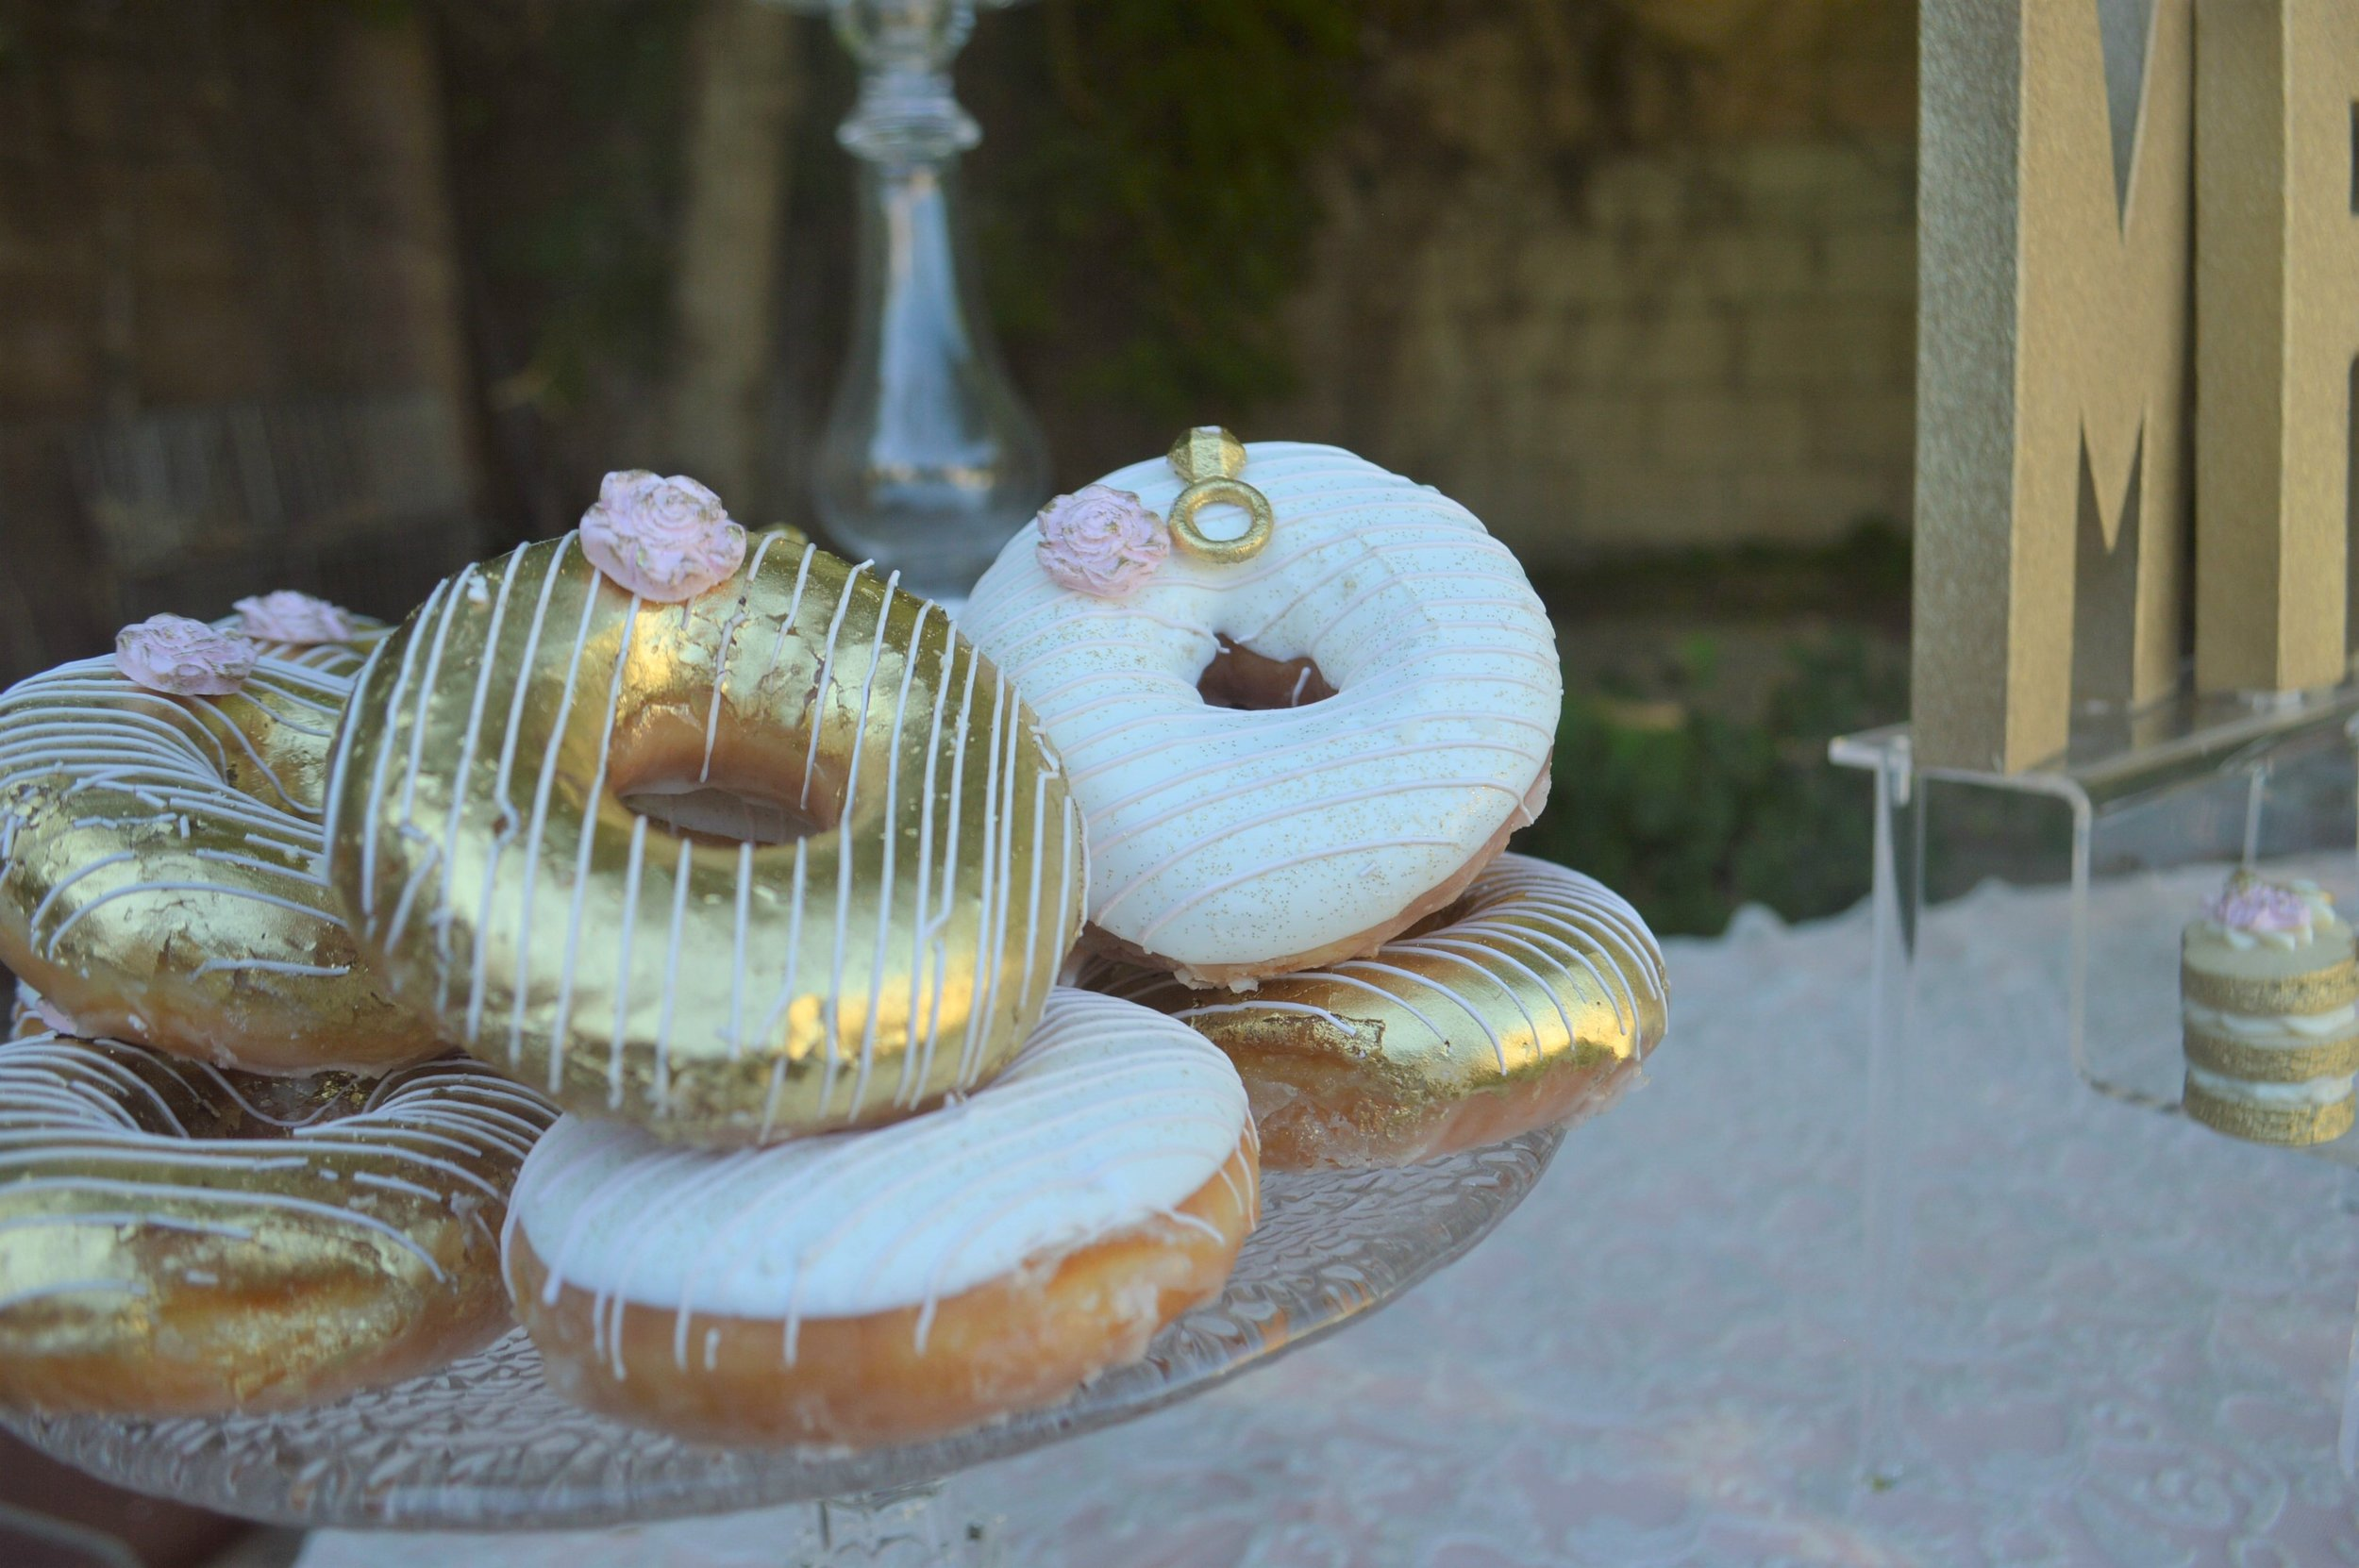 Wedding Desserts-Wedding Donuts-Donut Ideas-Wedding Ideas-Wedding Dessert Ideas-www.SugarPartiesLA.com.jpg